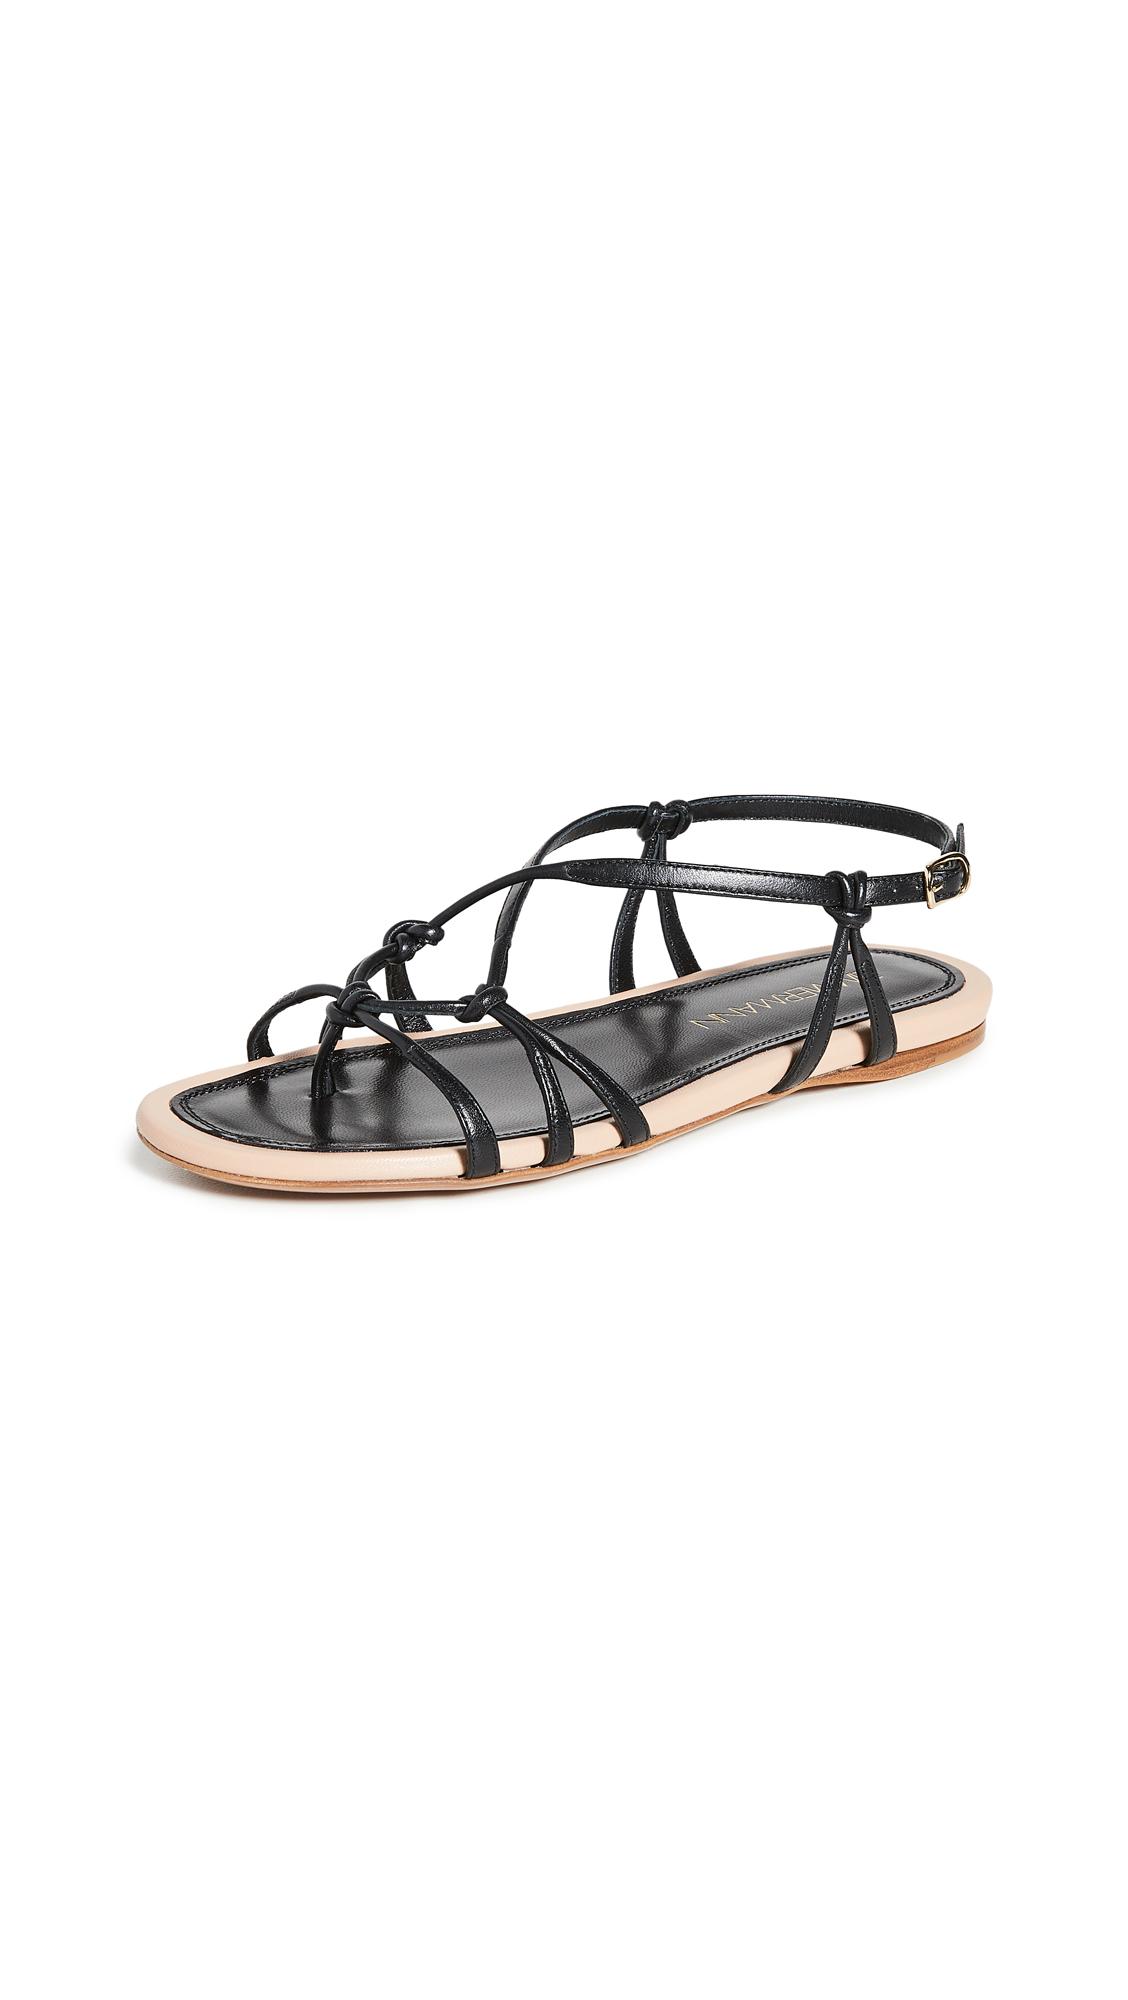 Buy Zimmermann Knotted Strap Flat Sandals online, shop Zimmermann